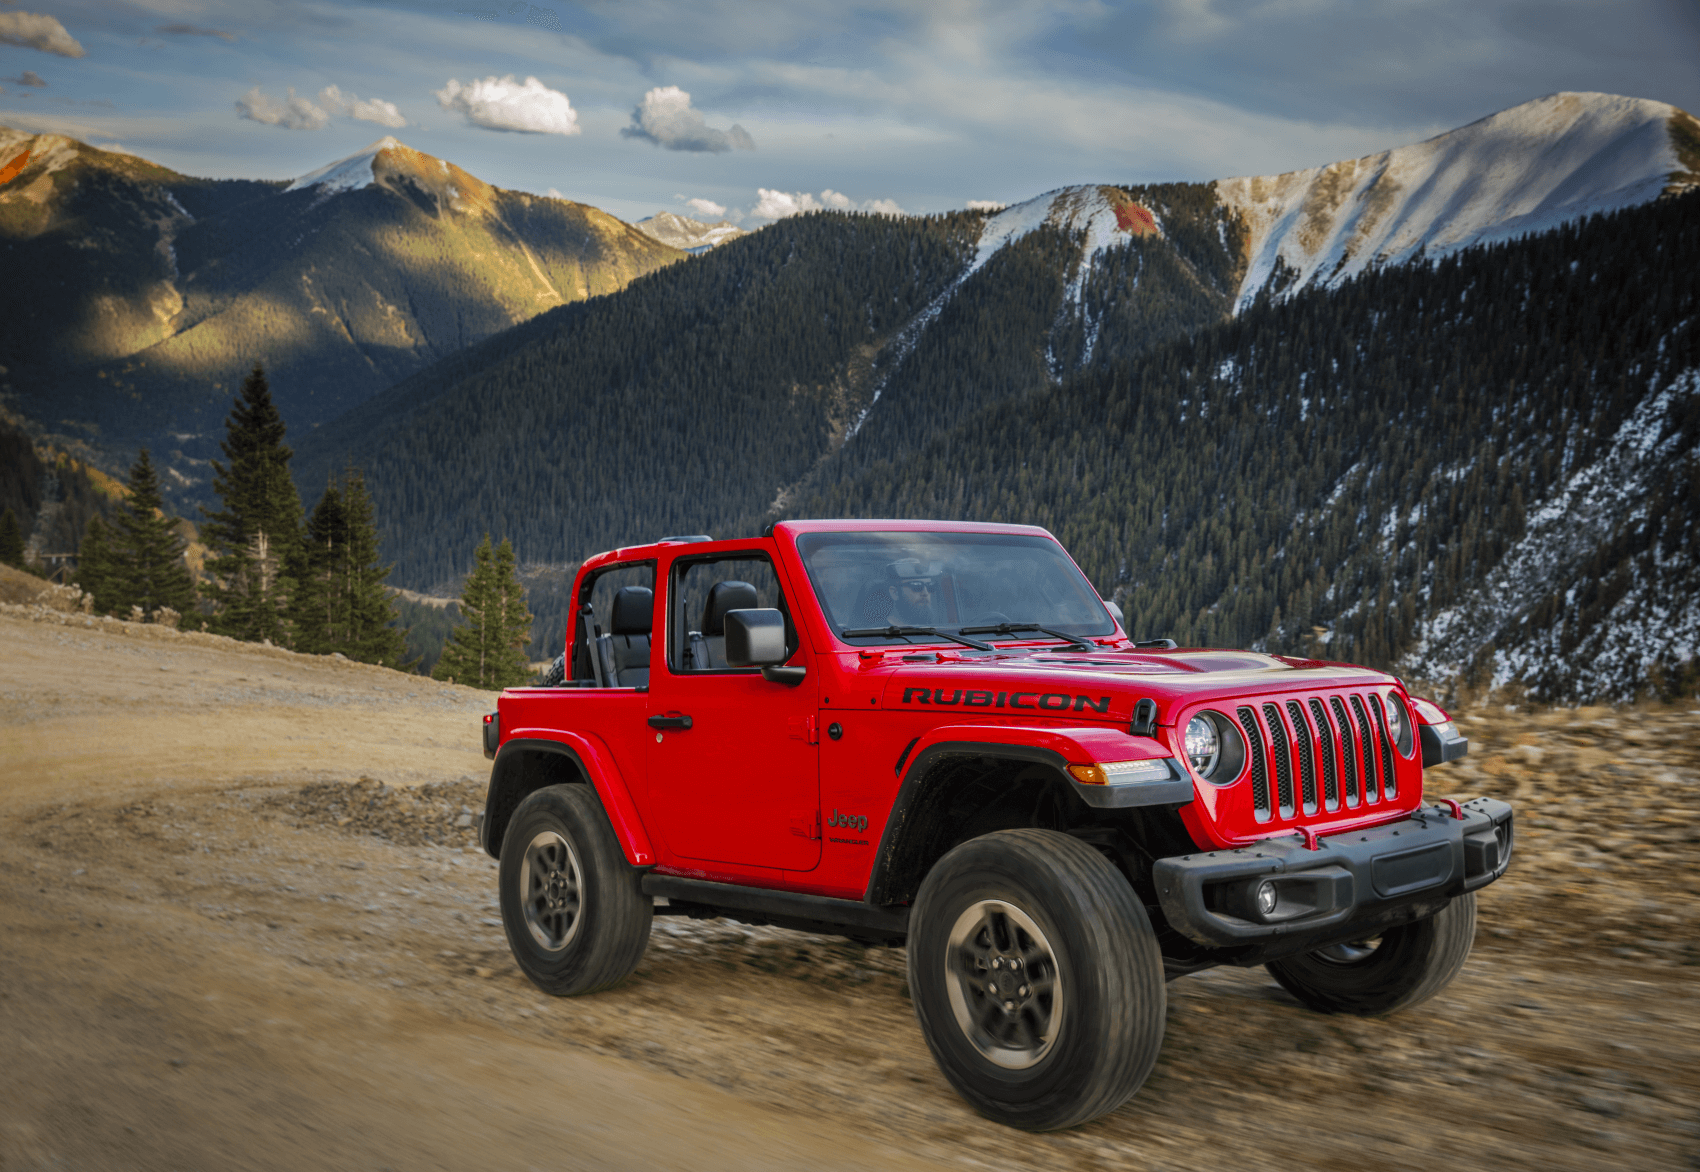 2021 Jeep Wrangler Red Mountain Road C. Harper CDJR